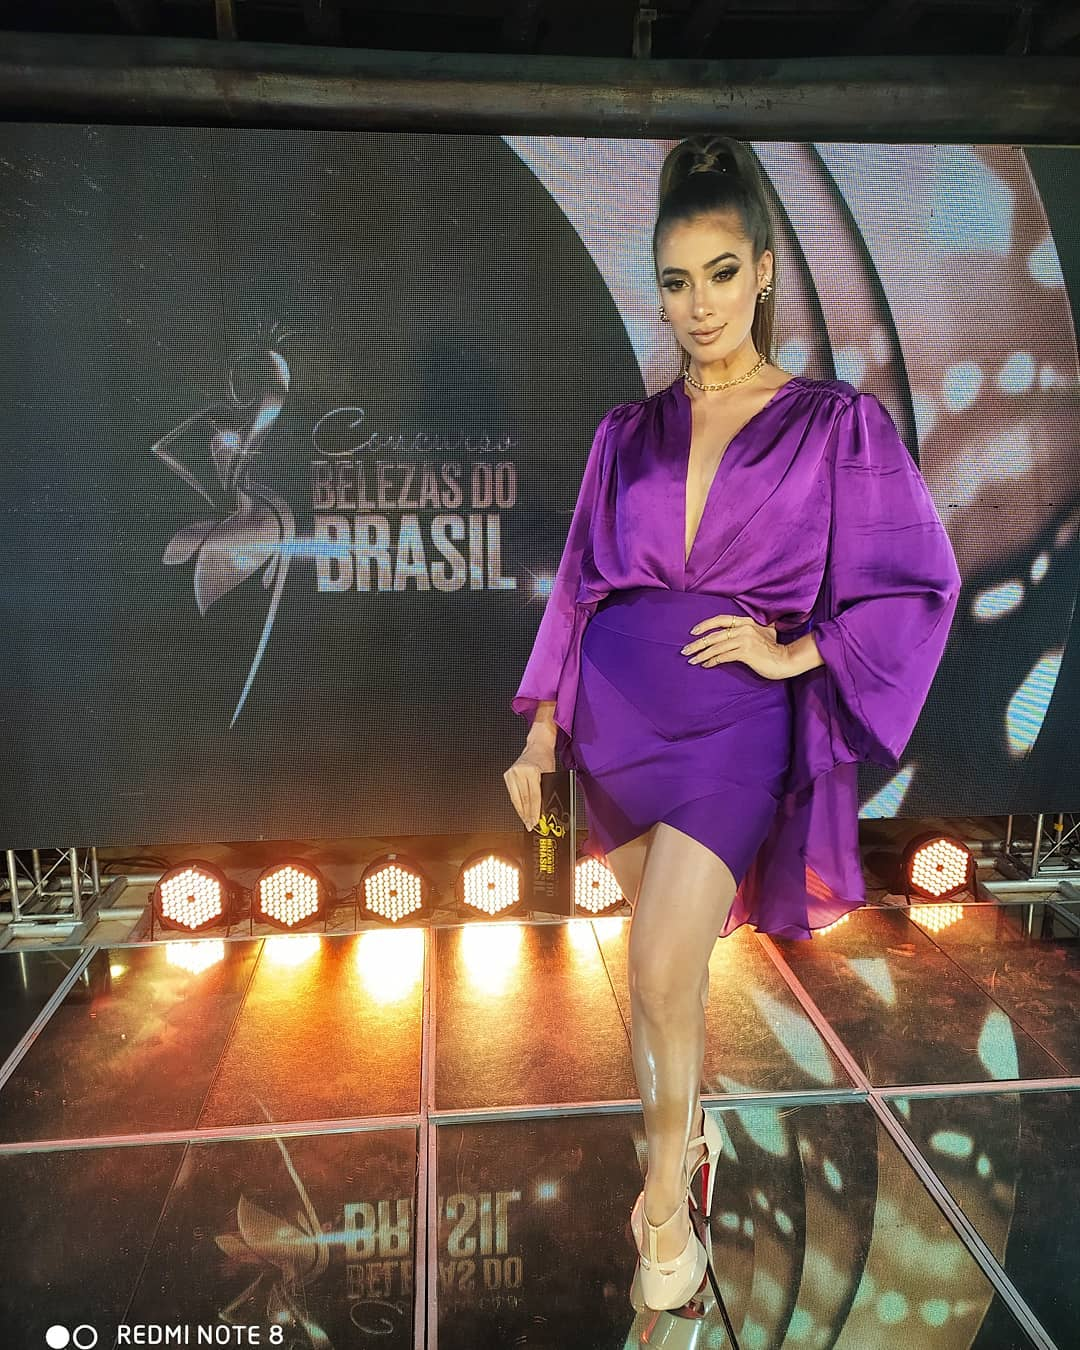 natalia gurgel, top model brasil 2021/miss morada nova 2019/miss sertao central empresarial 2018/top 20 de miss asia pacific international 2018, representando o uruguai. - Página 5 21373110